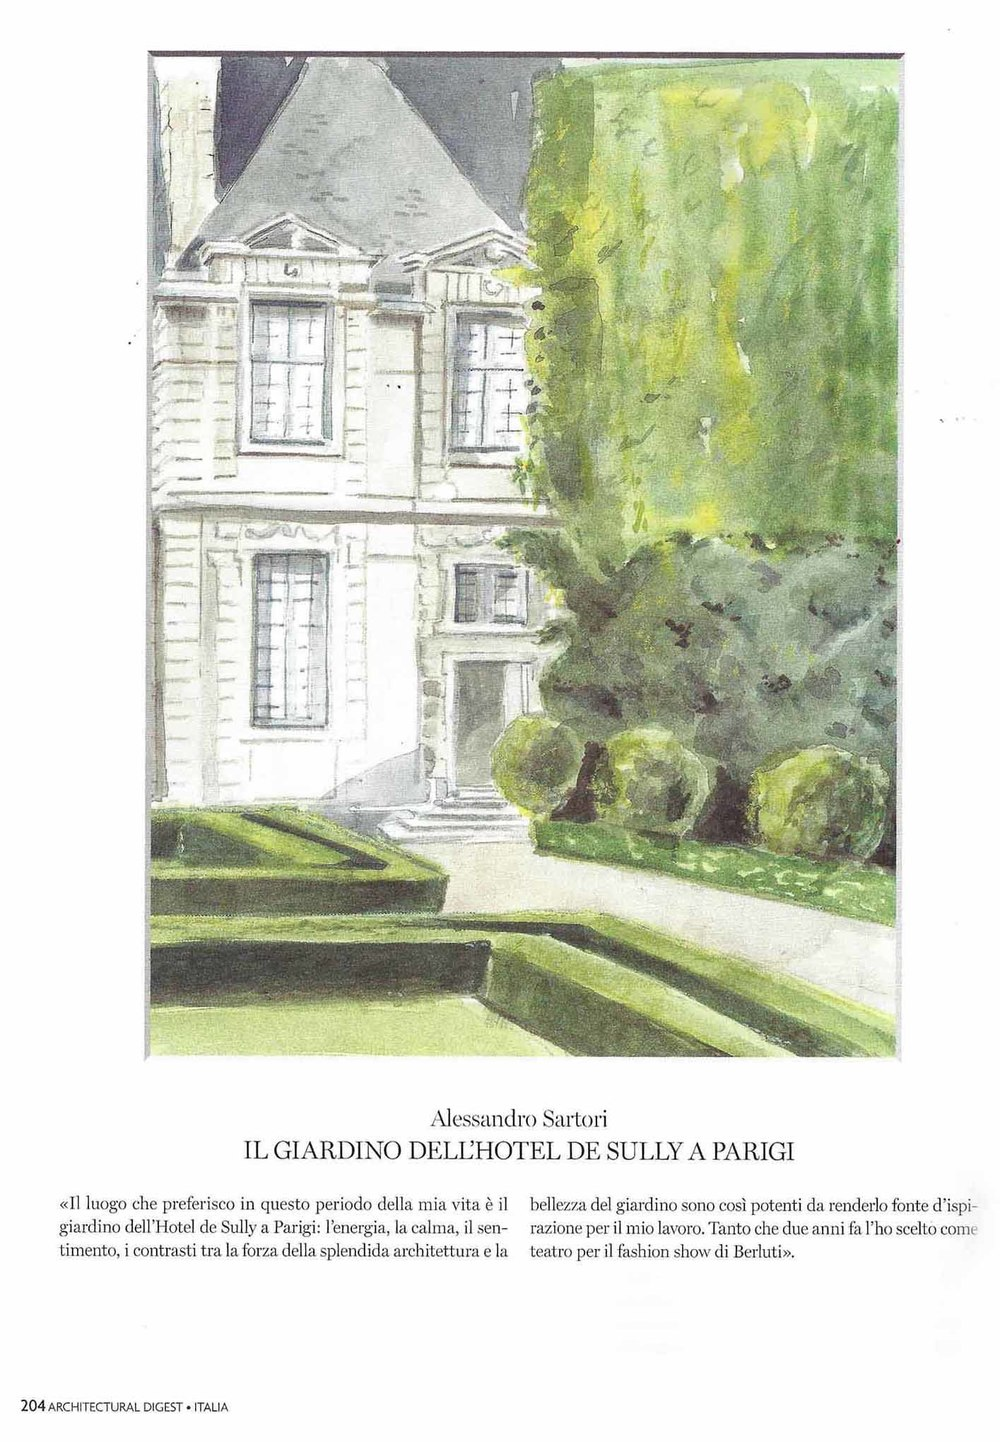 Alessandro Sartori - Gardens of Hotel de Sully